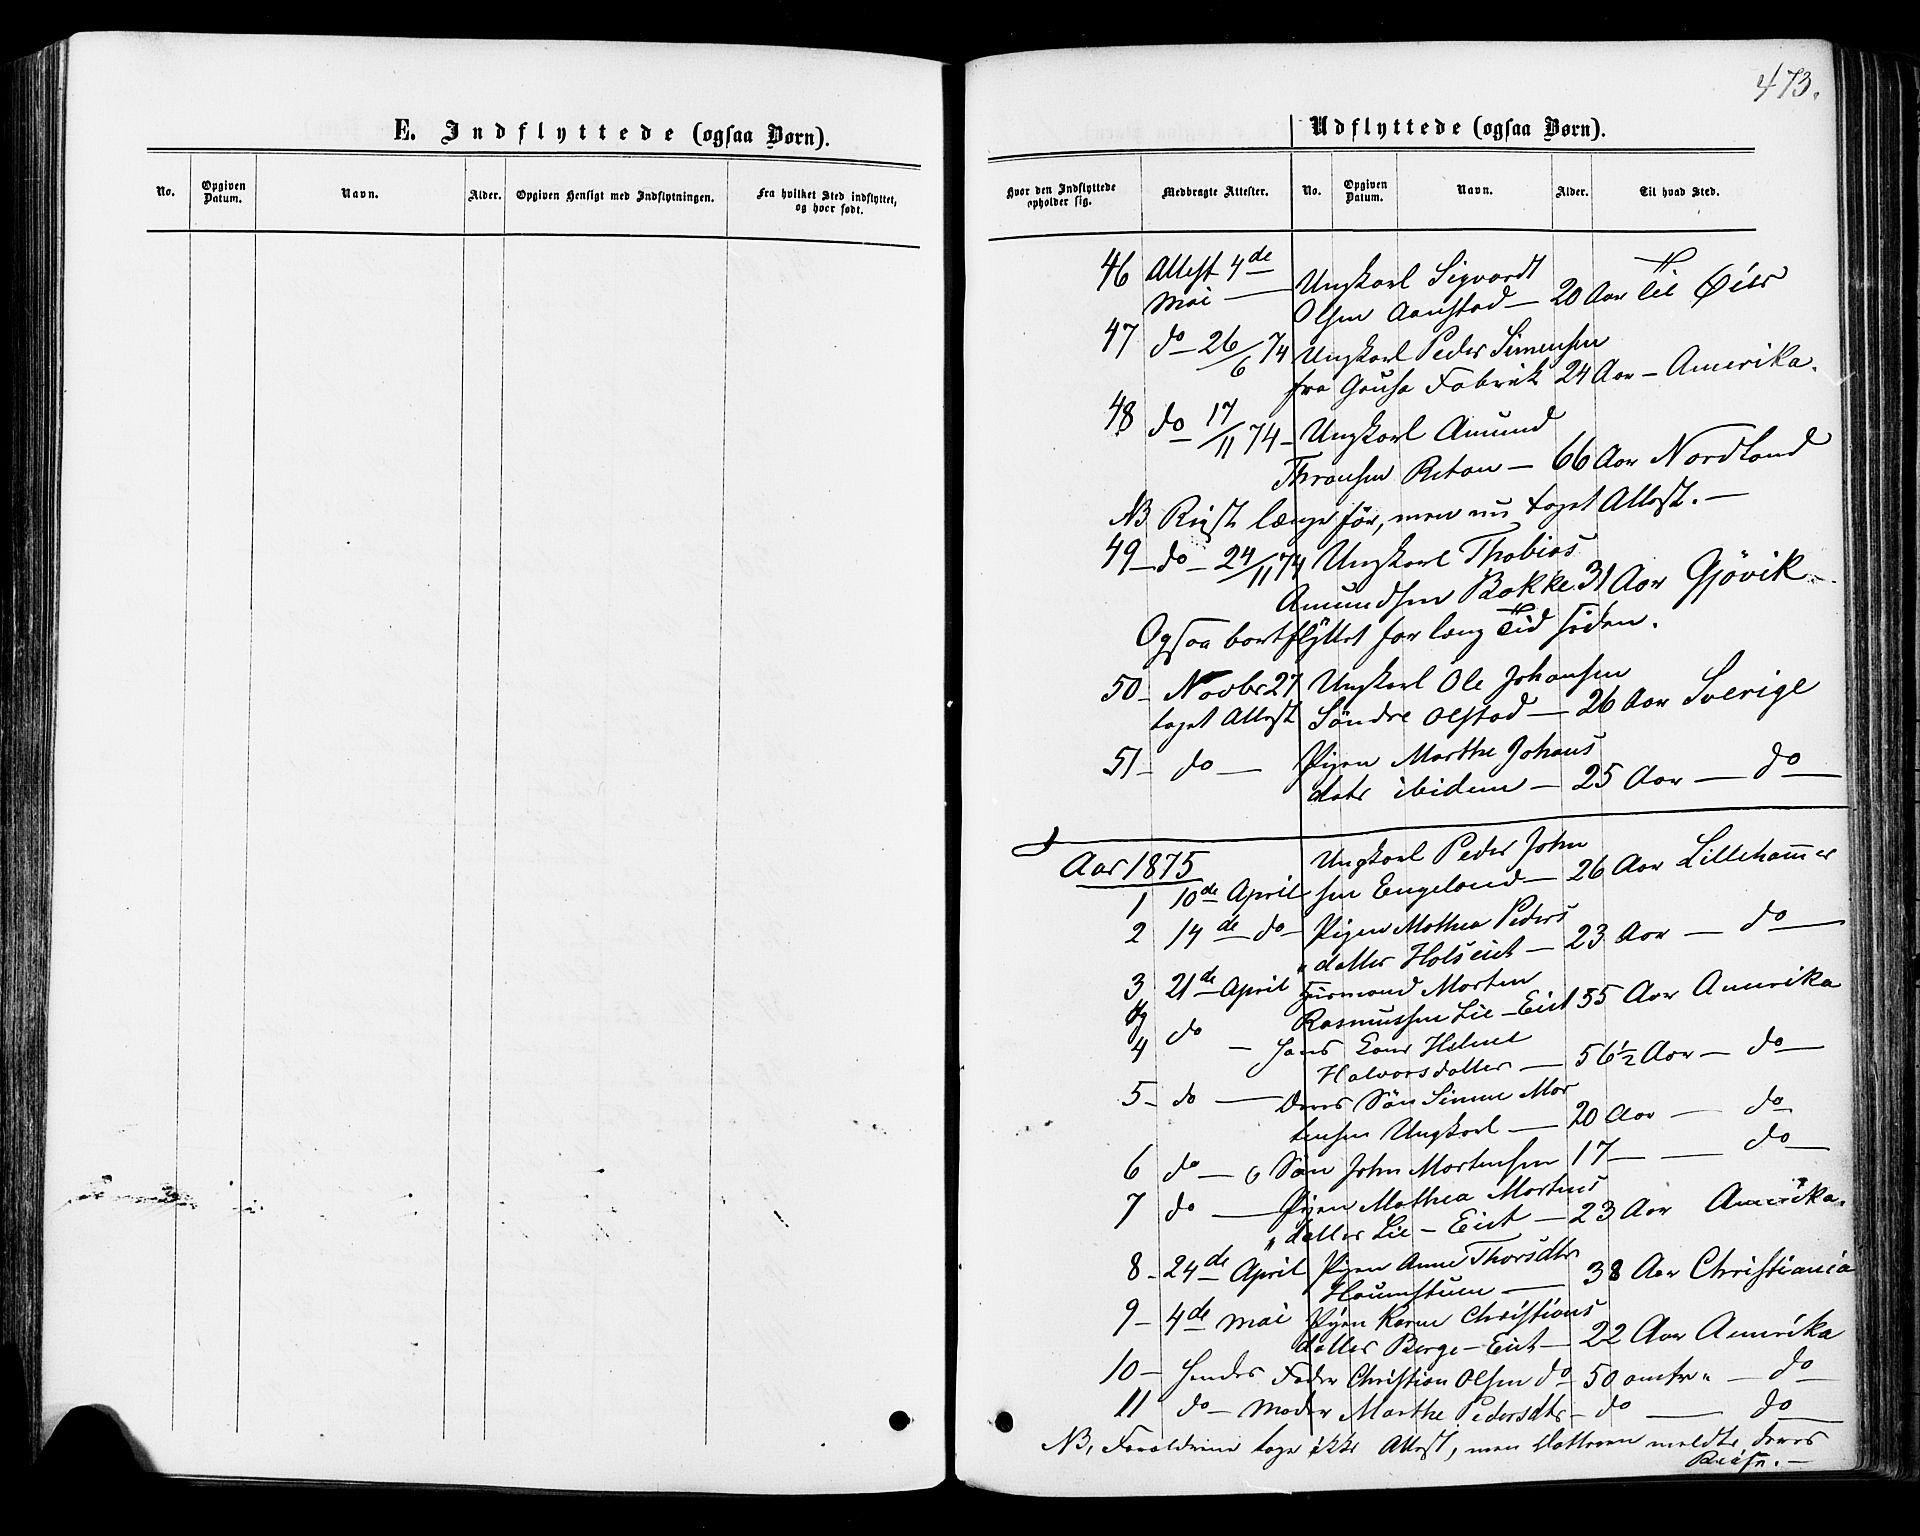 SAH, Østre Gausdal prestekontor, Ministerialbok nr. 1, 1874-1886, s. 473